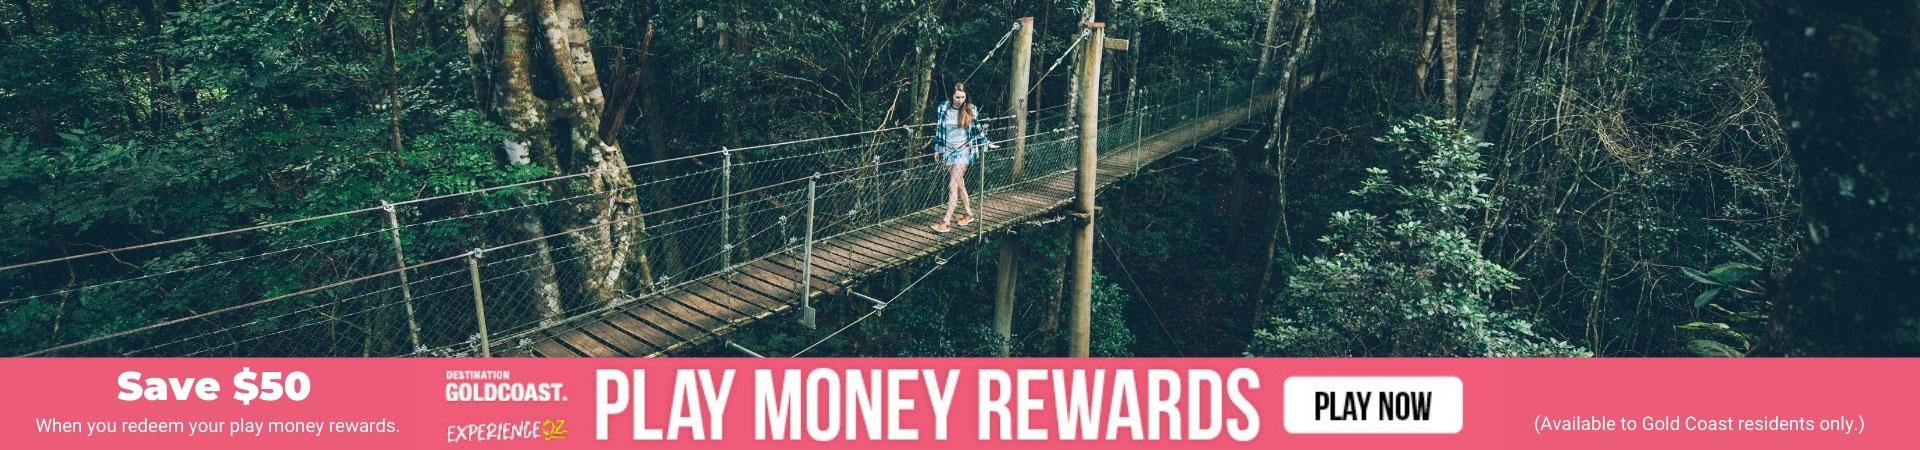 Gold Coast Play Money Rewards